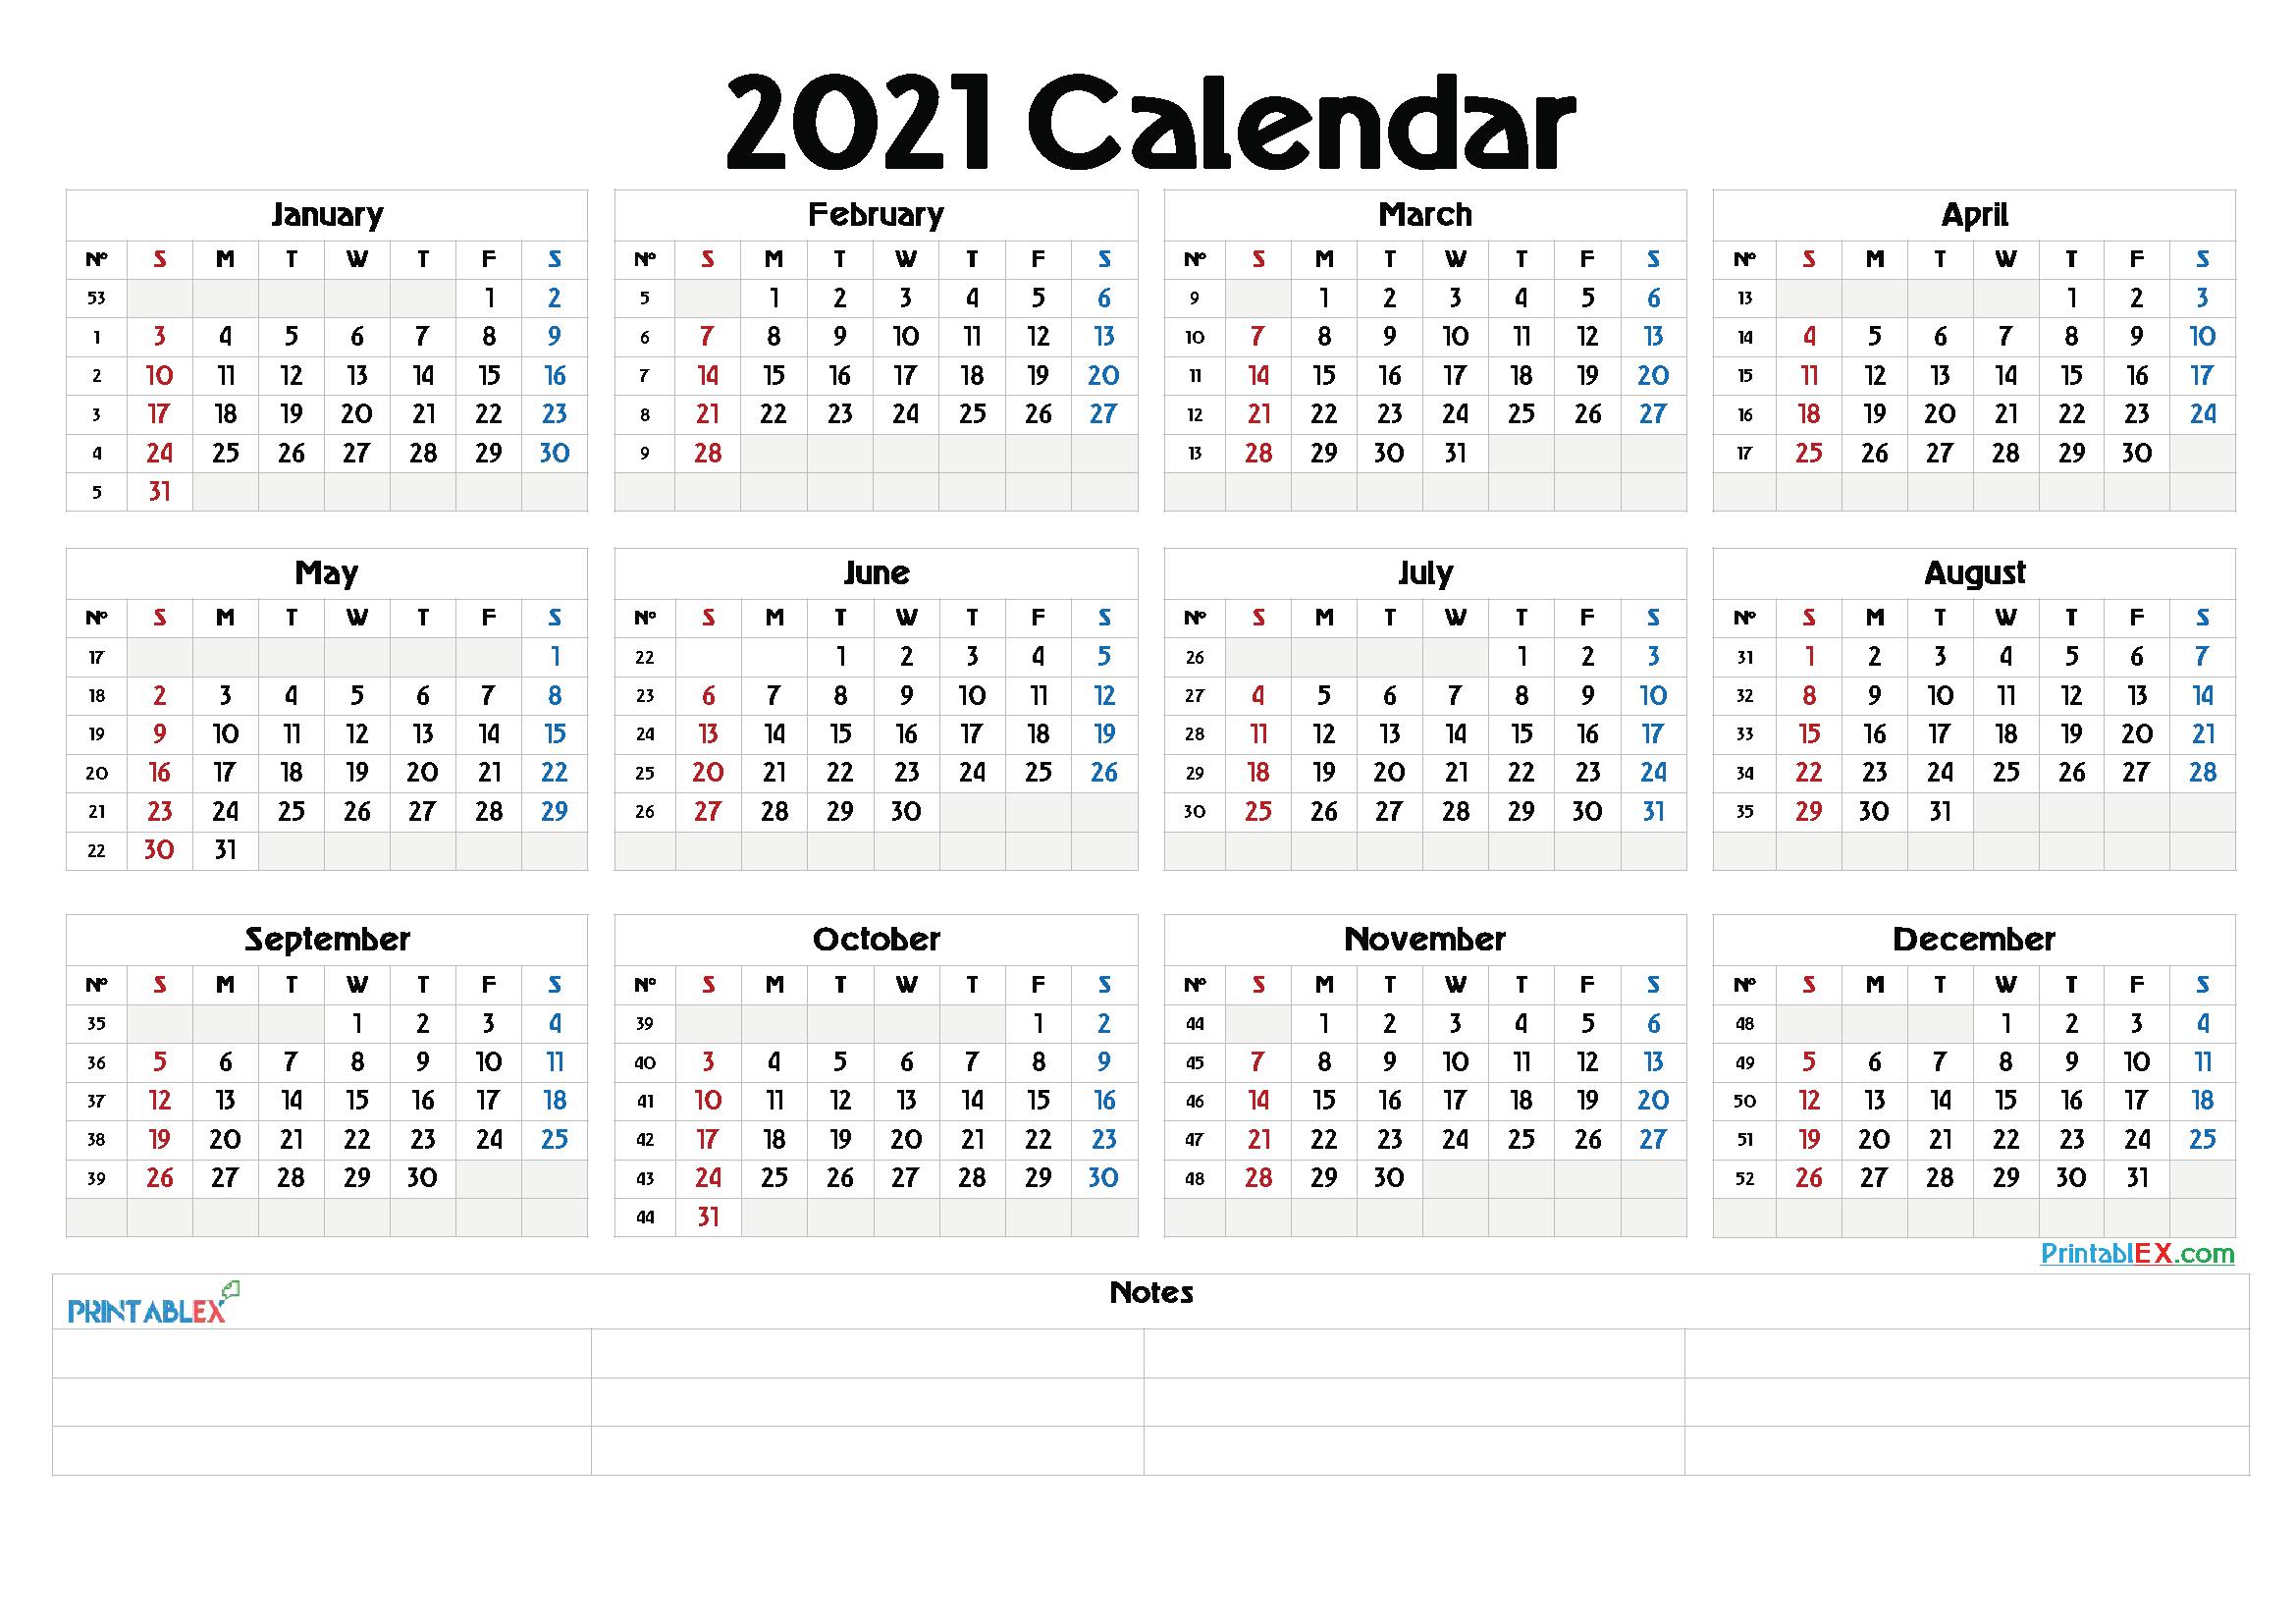 Whole Year Calendar 2021 | Printable Calendars 2021